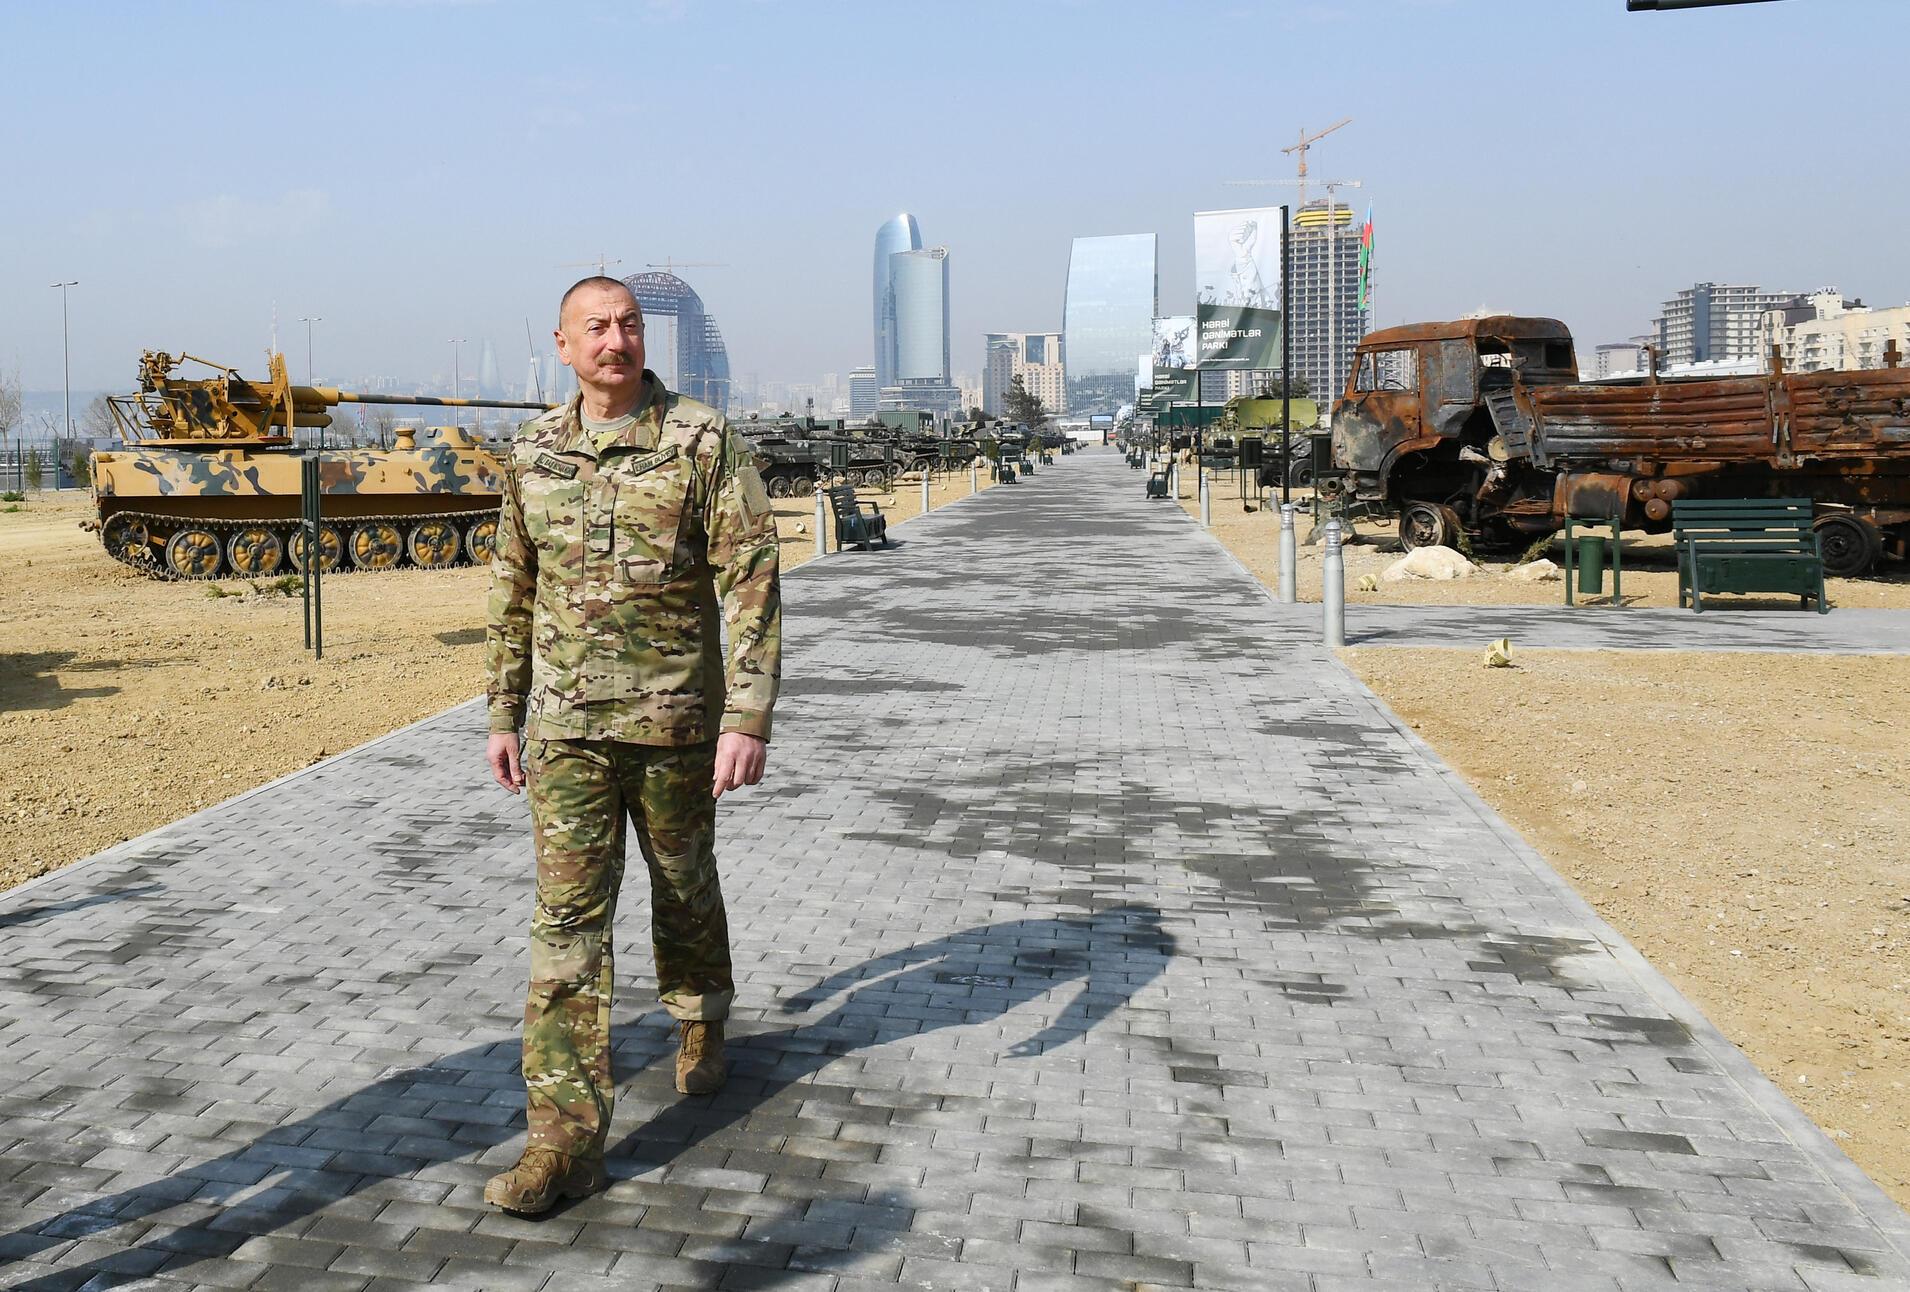 Image d'archive RFI - azerbaidjan-aliyev-parc-trophees